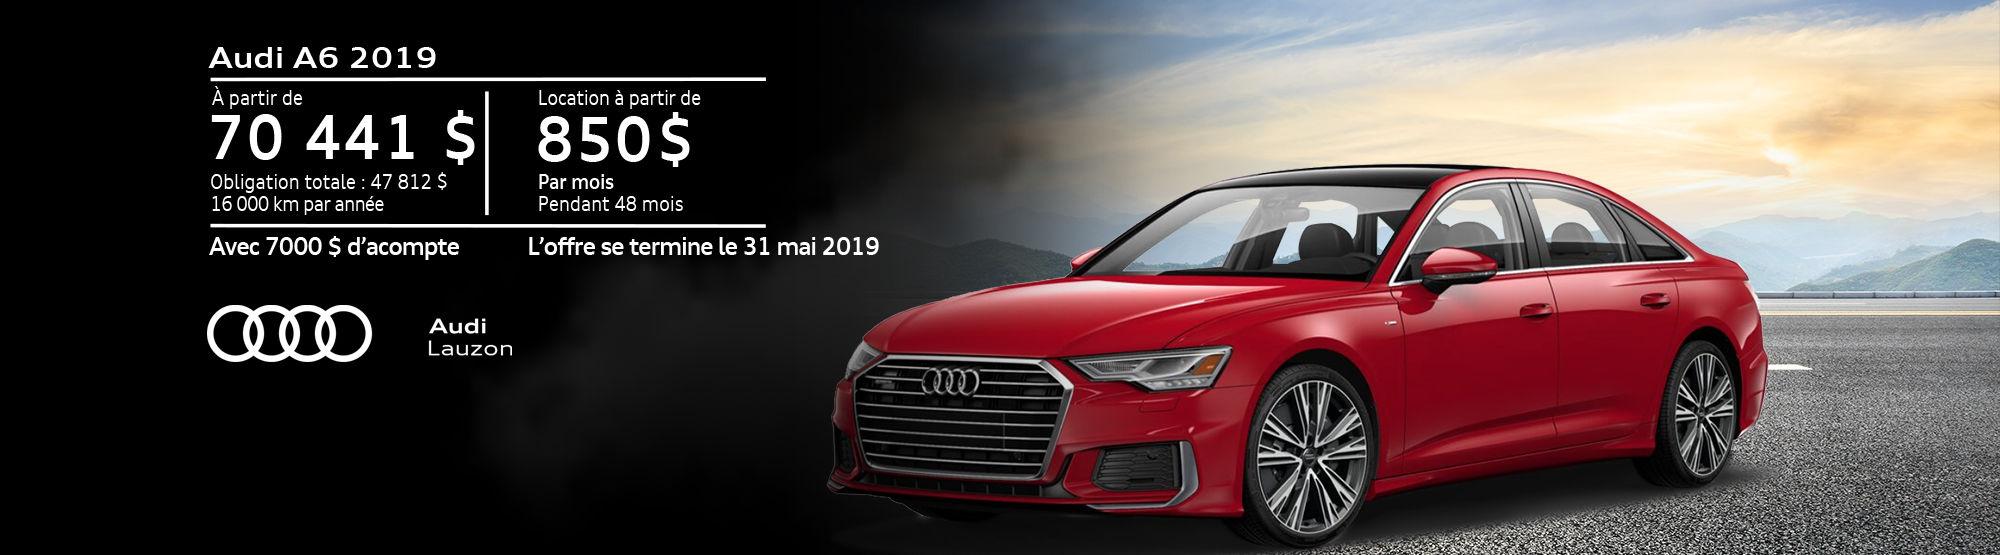 Audi A6 mai 2019